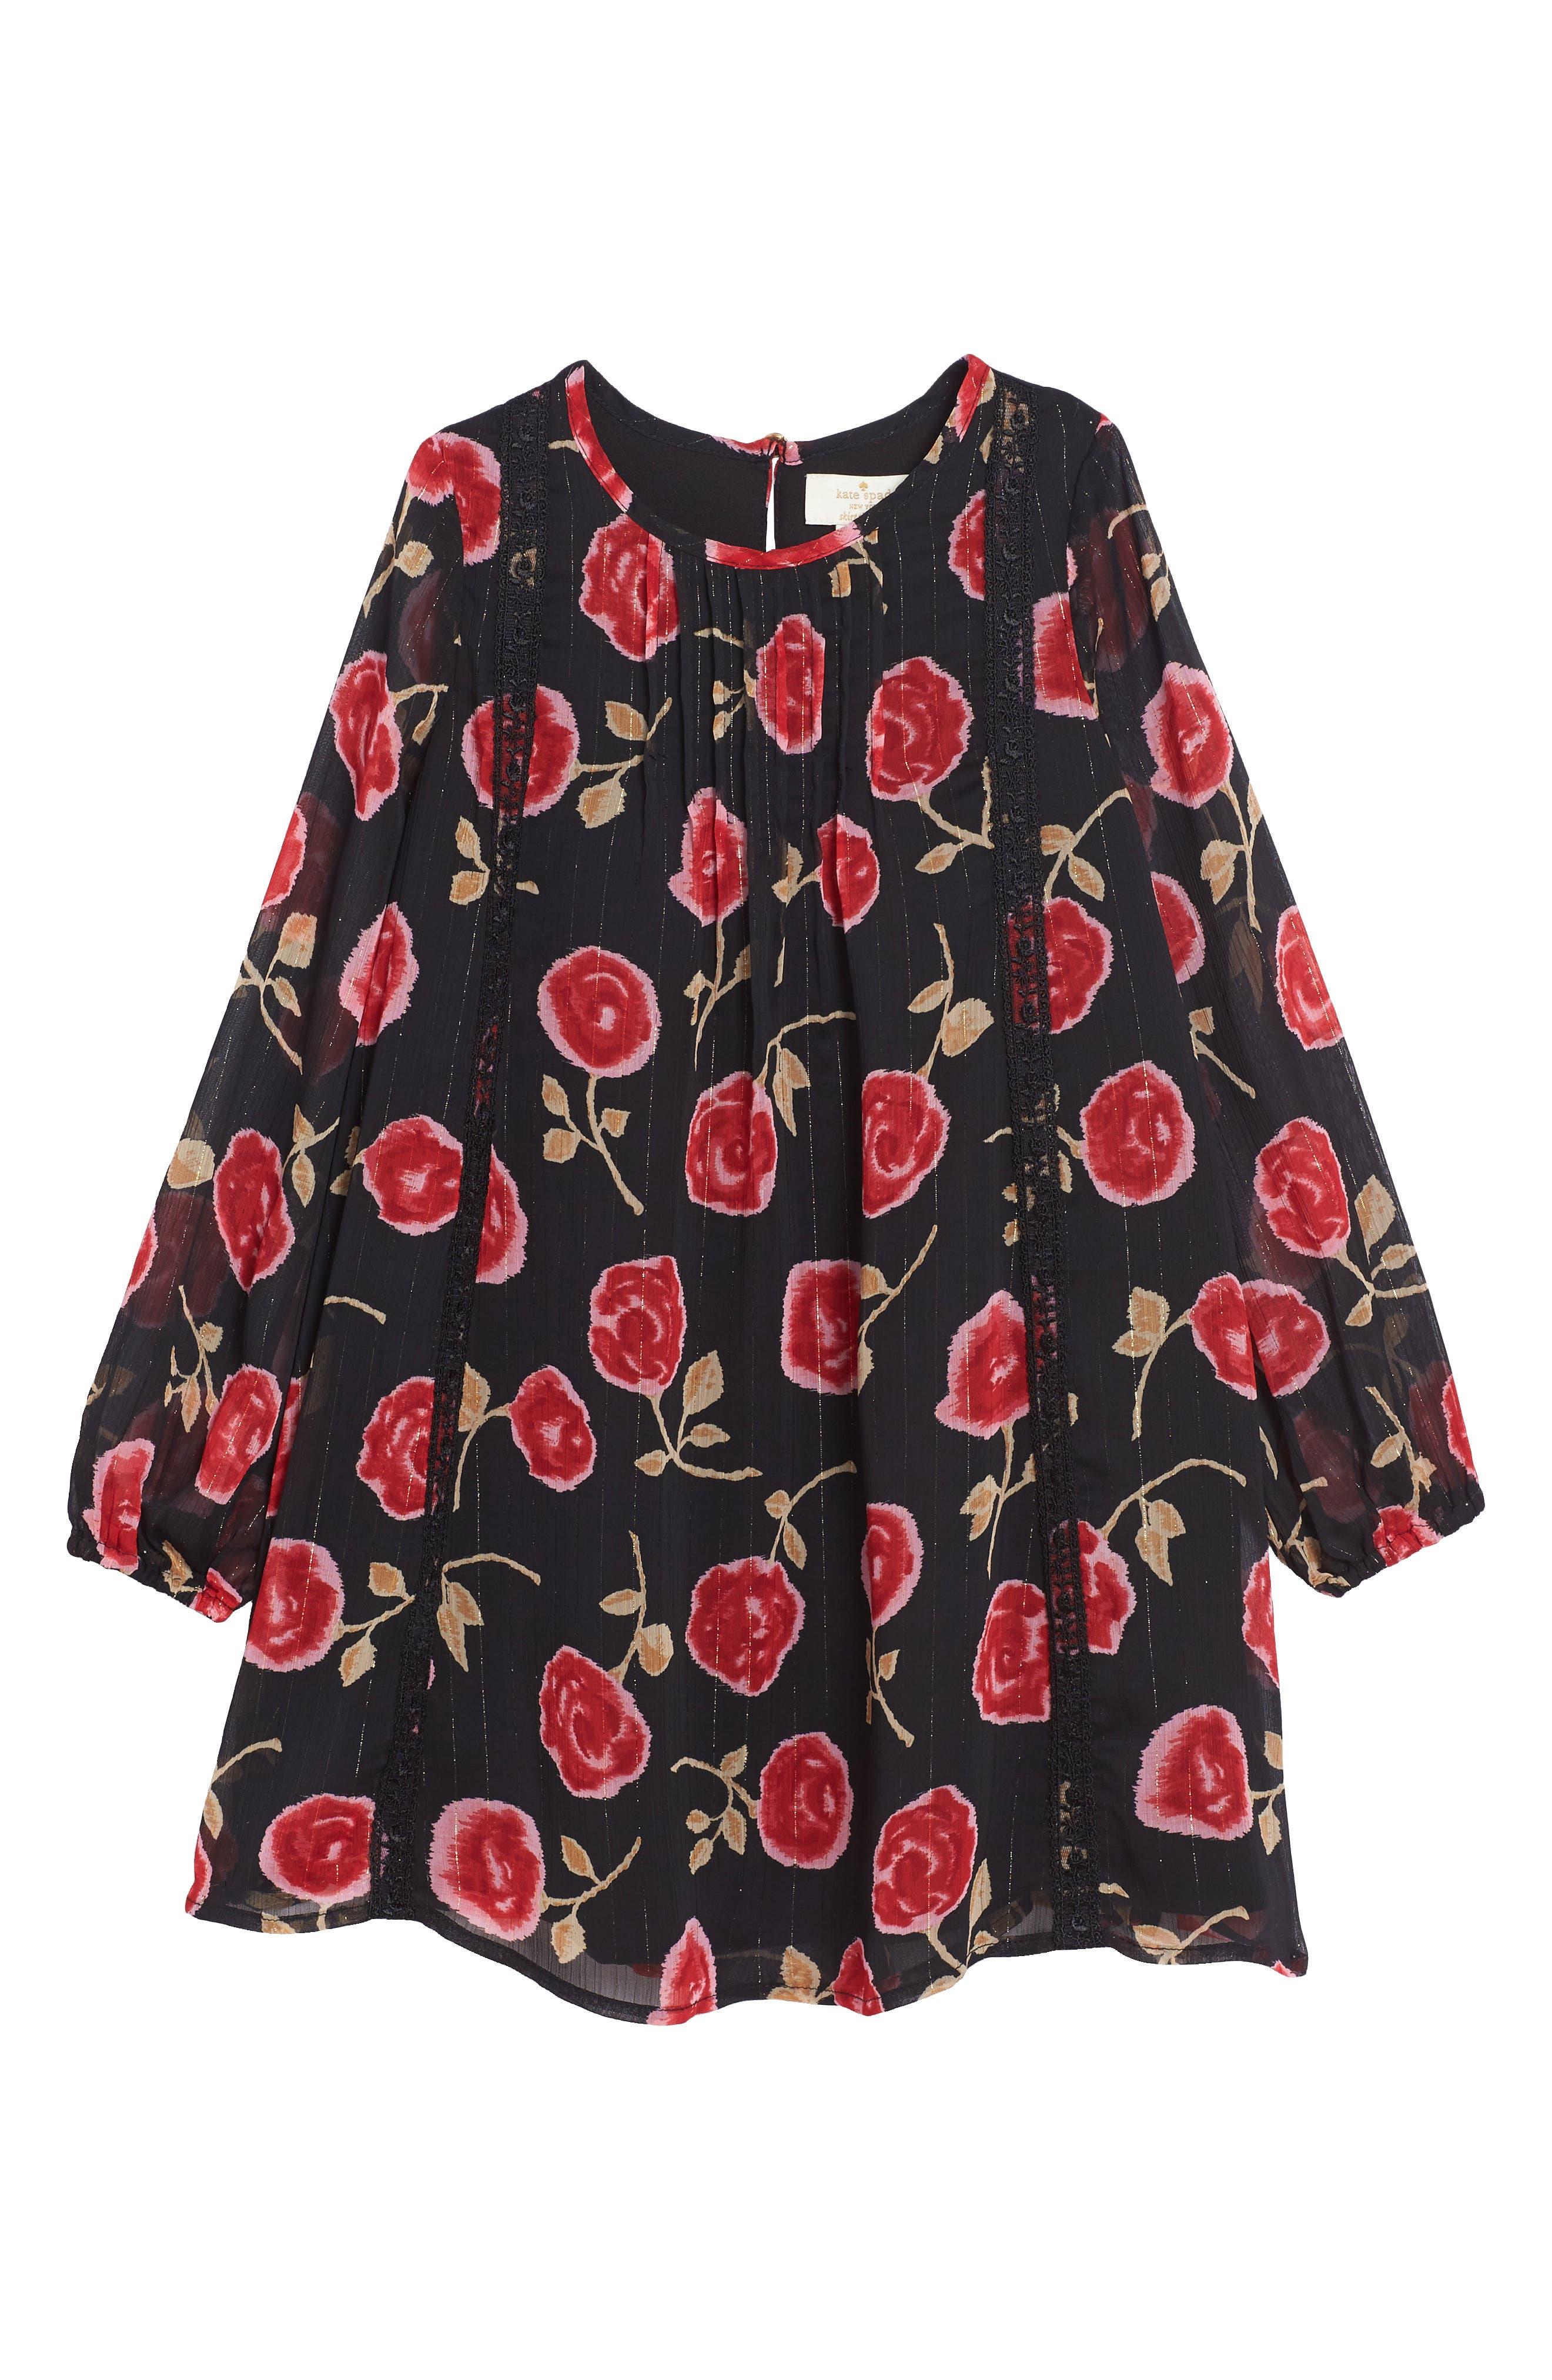 kate spade new york rose print chiffon dress (Big Girls)